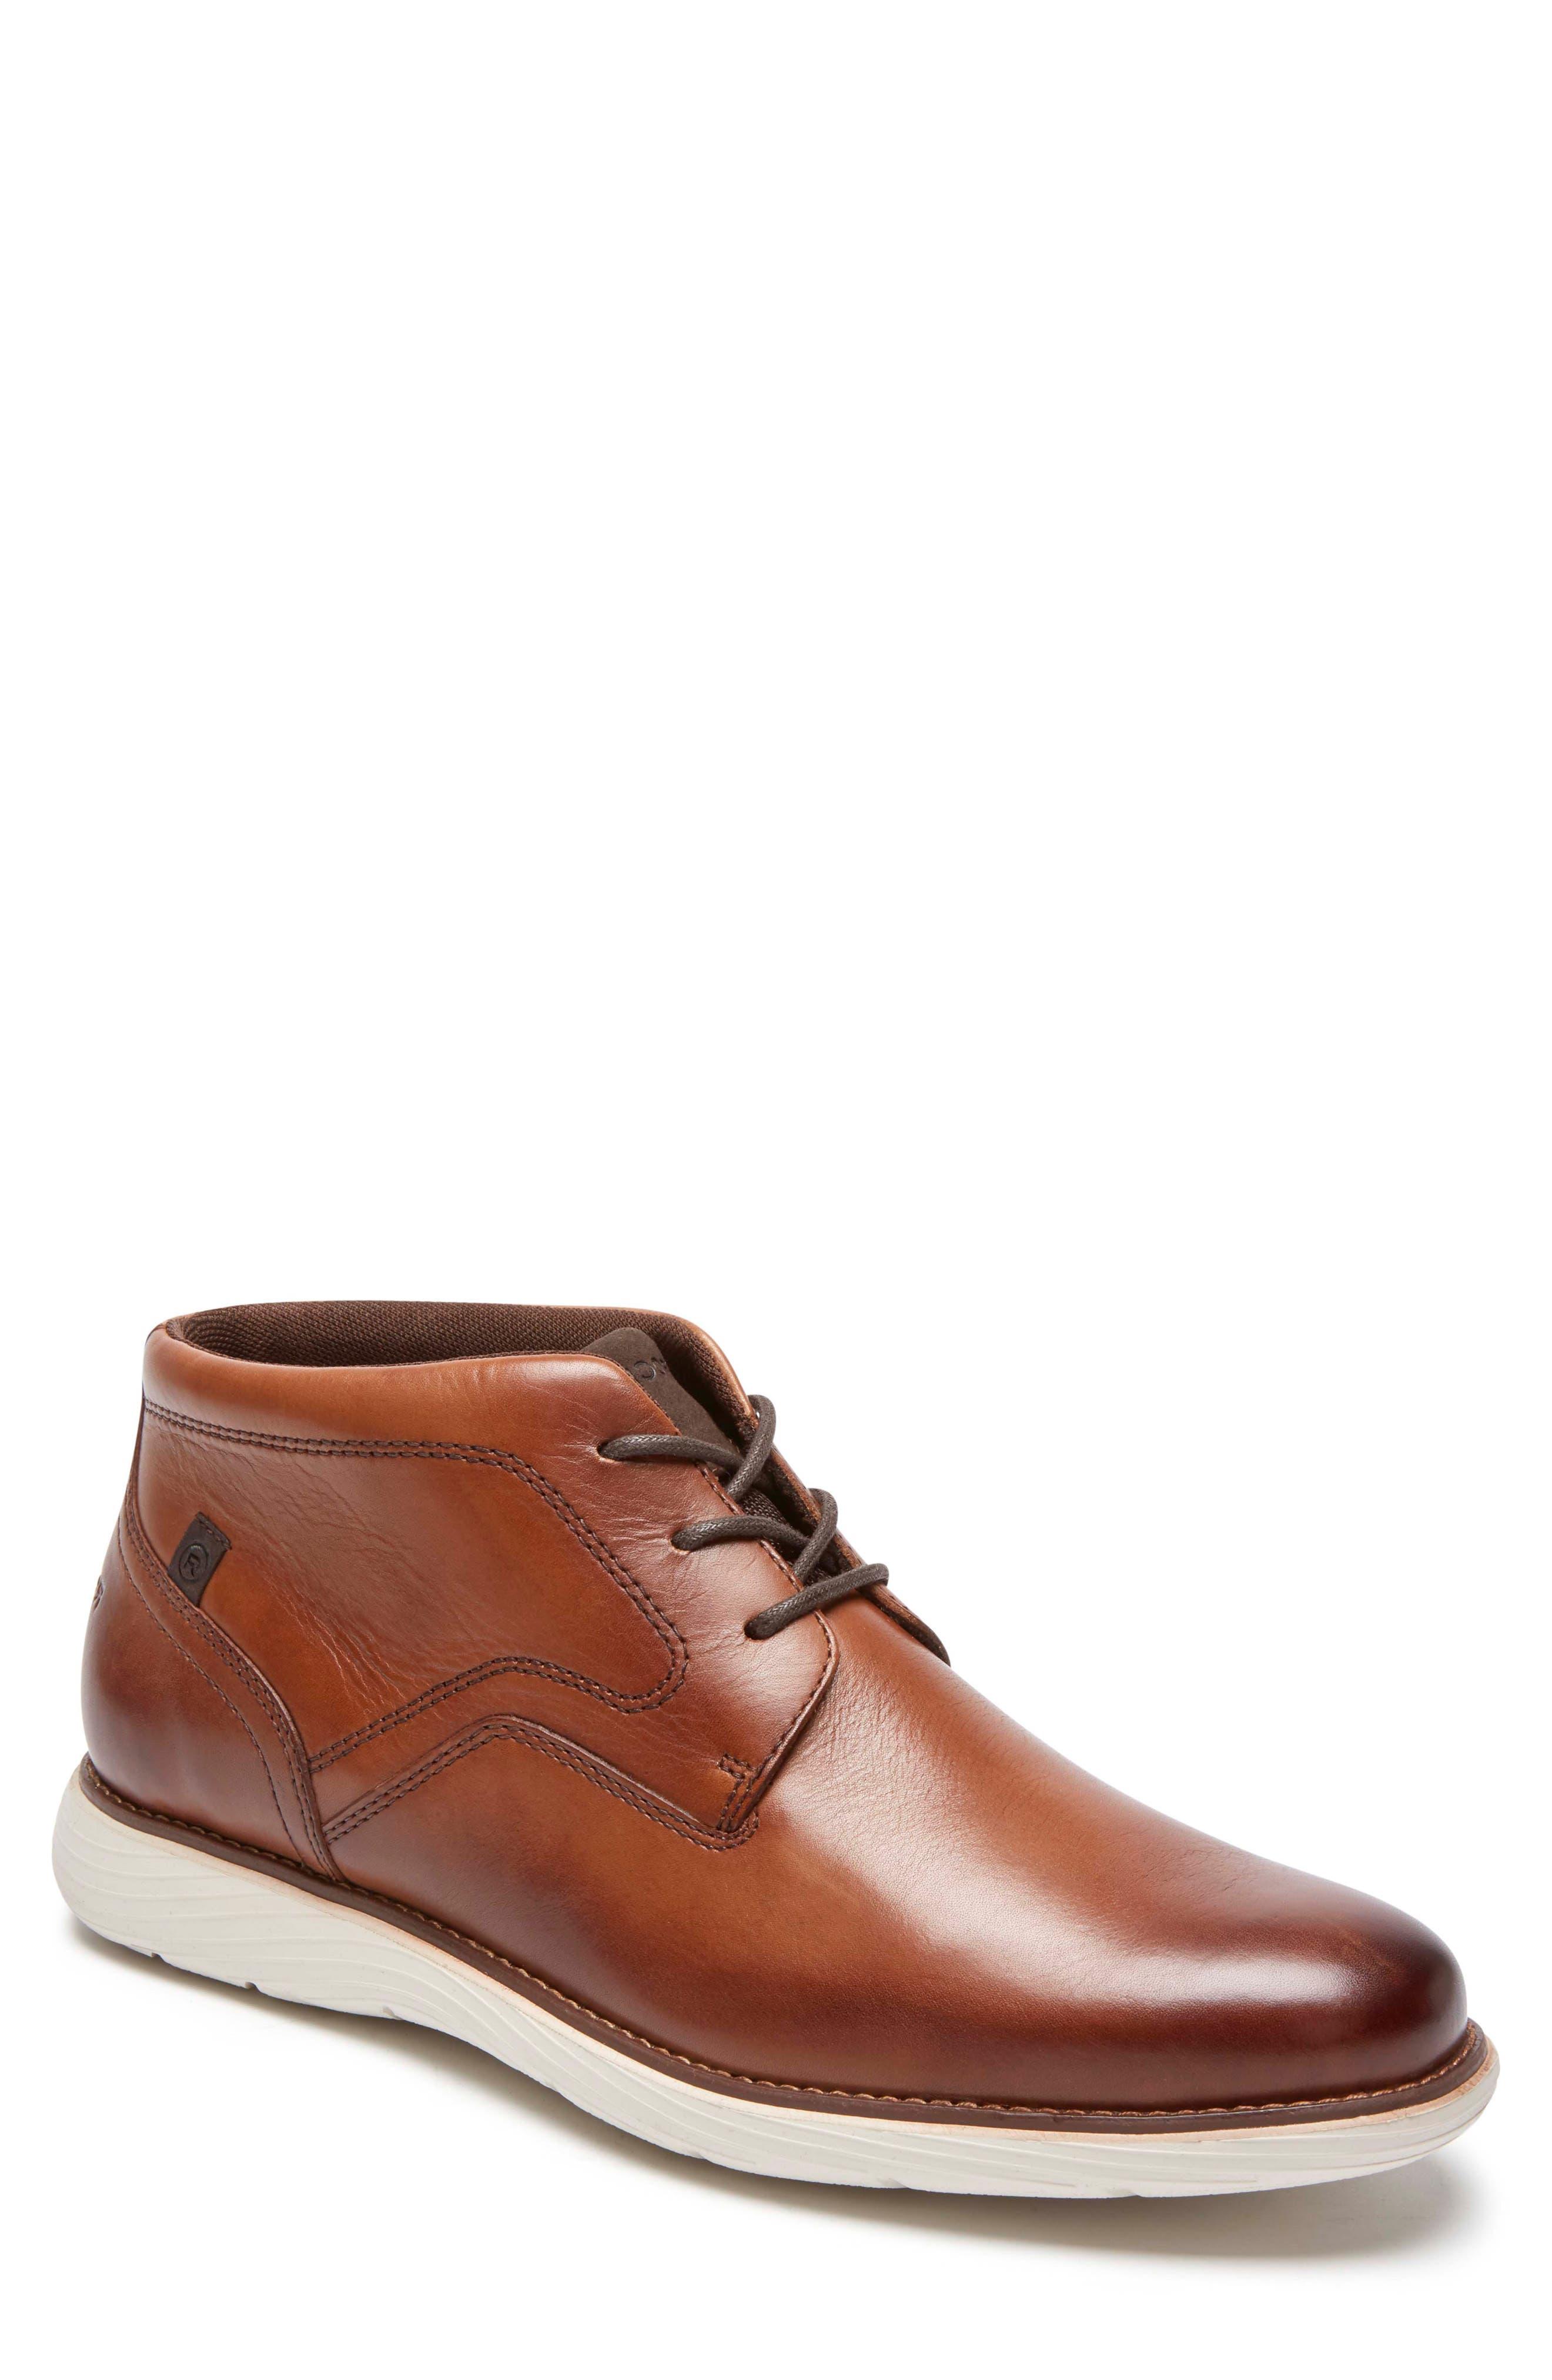 Rockport Kessler Chukka Boot- Brown